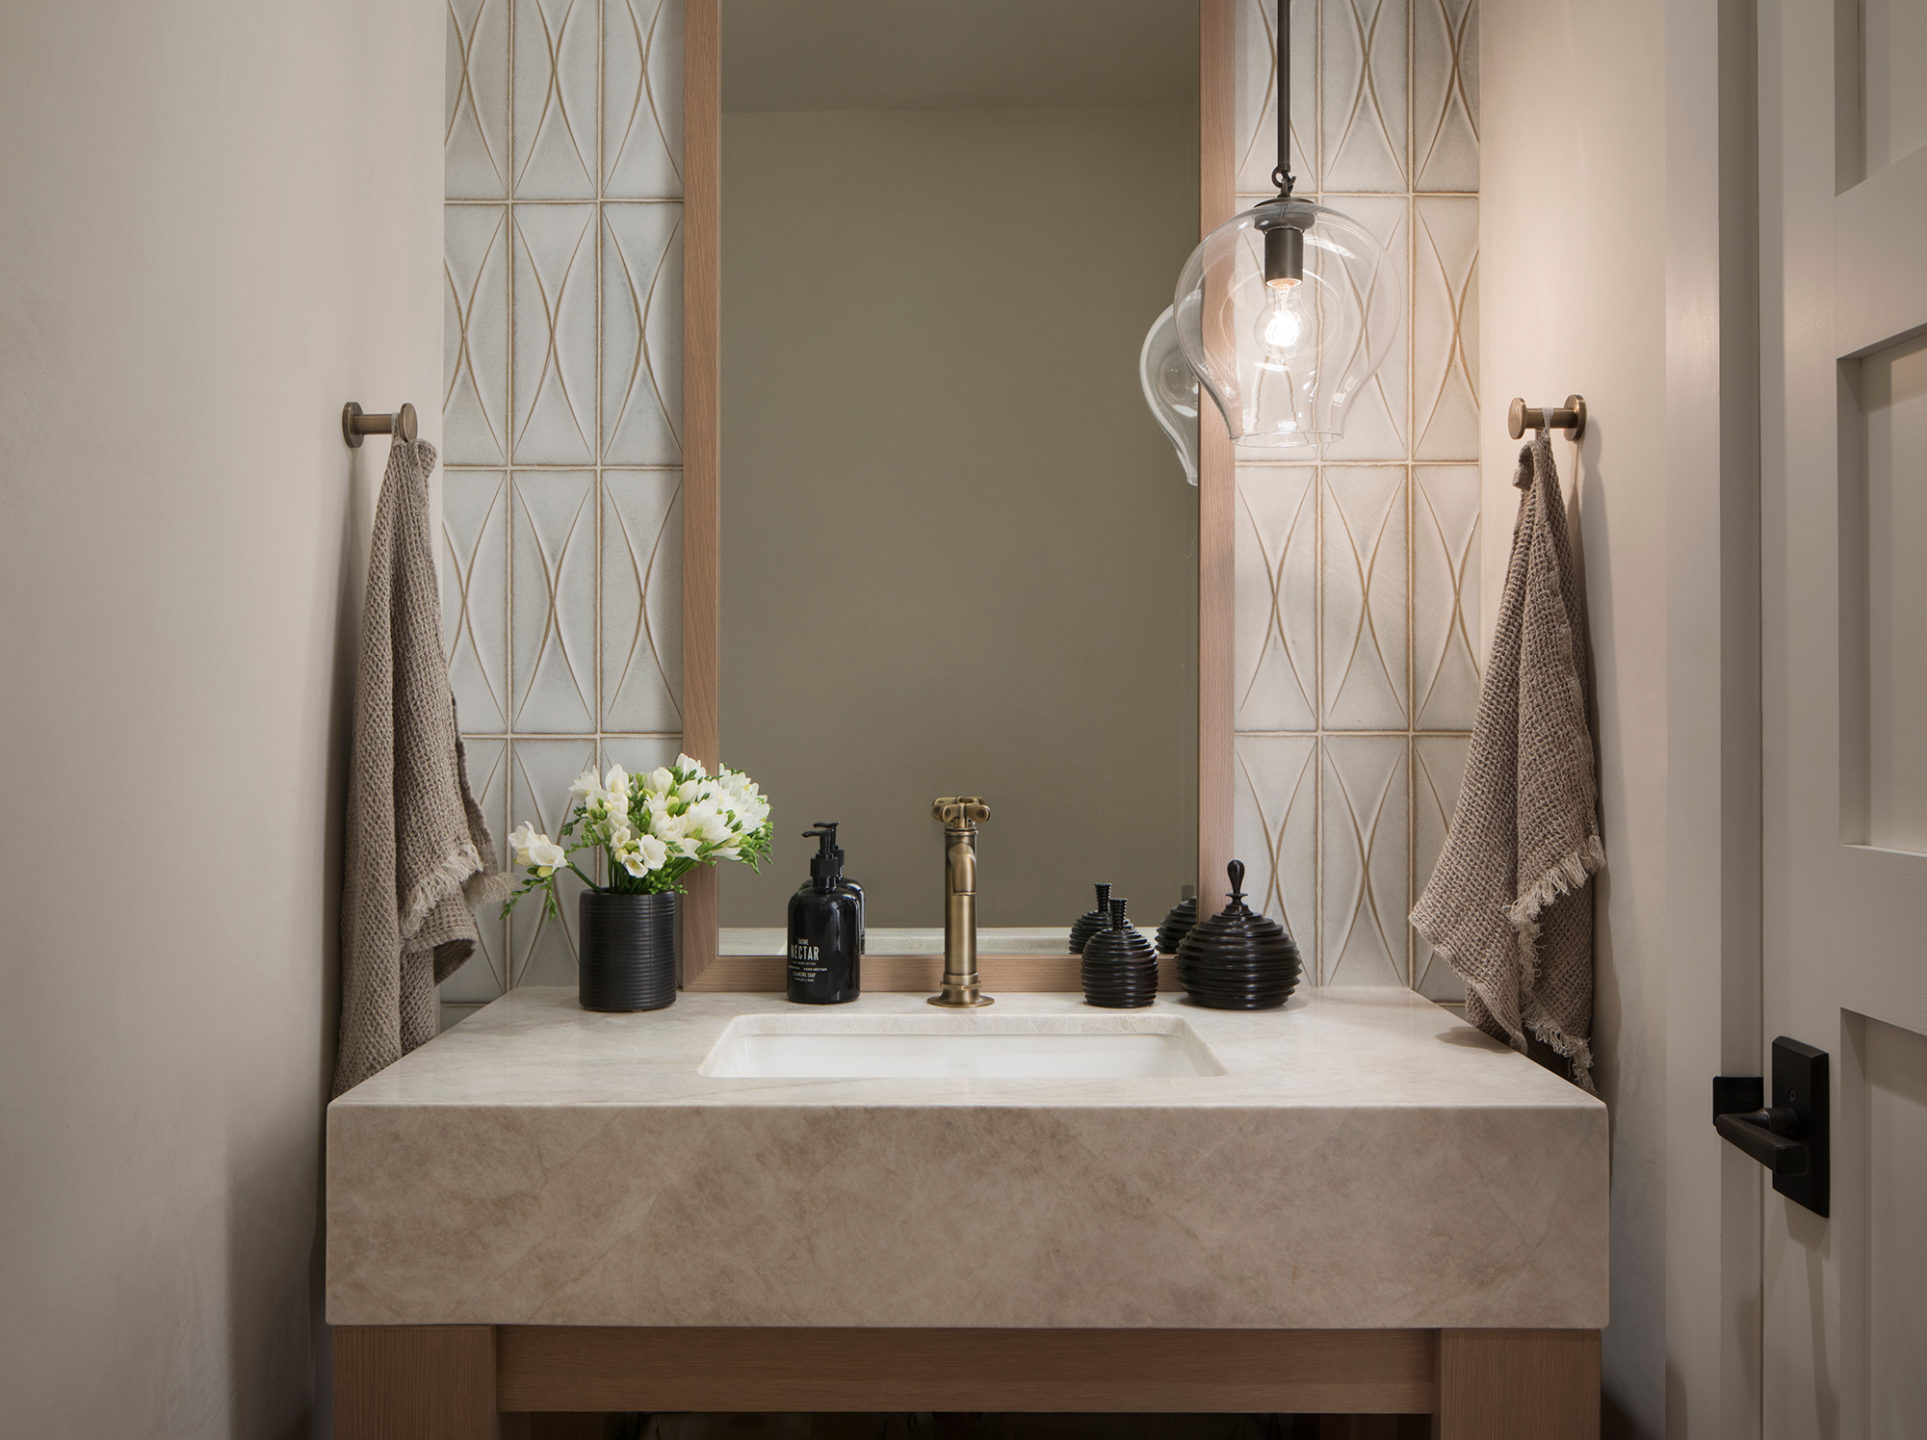 Jennifer_robins_interiors_projects_st_helena_IIII_Conn_13_HR_sink_bathroom